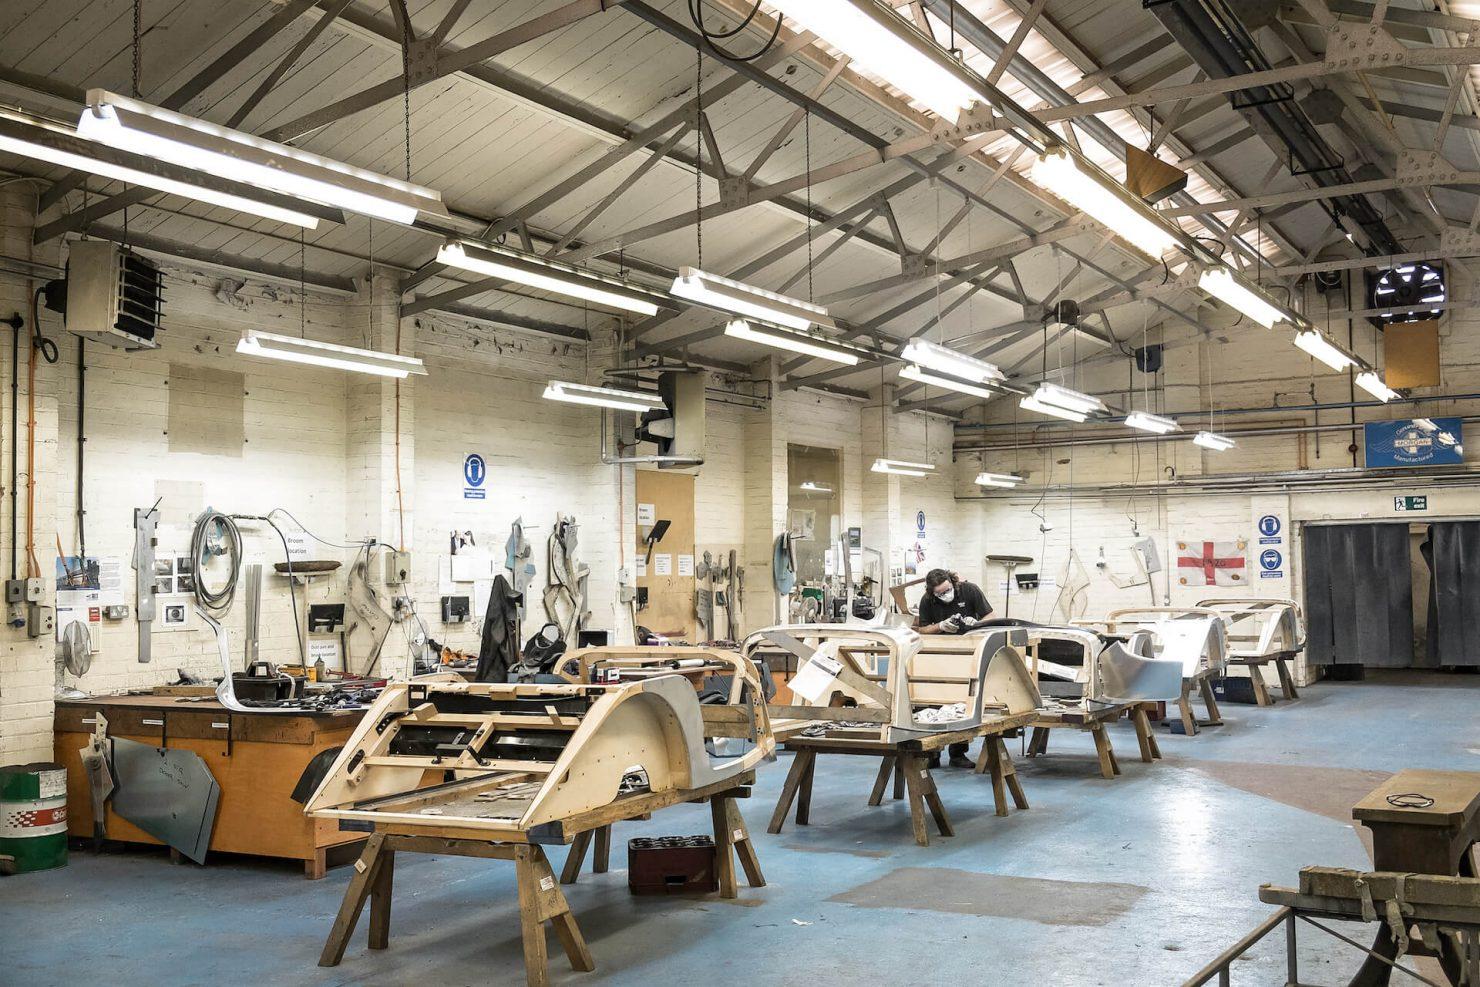 Morgan Motor Company Factory 1480x987 - Morgan: The Most Honest Car Factory in the World